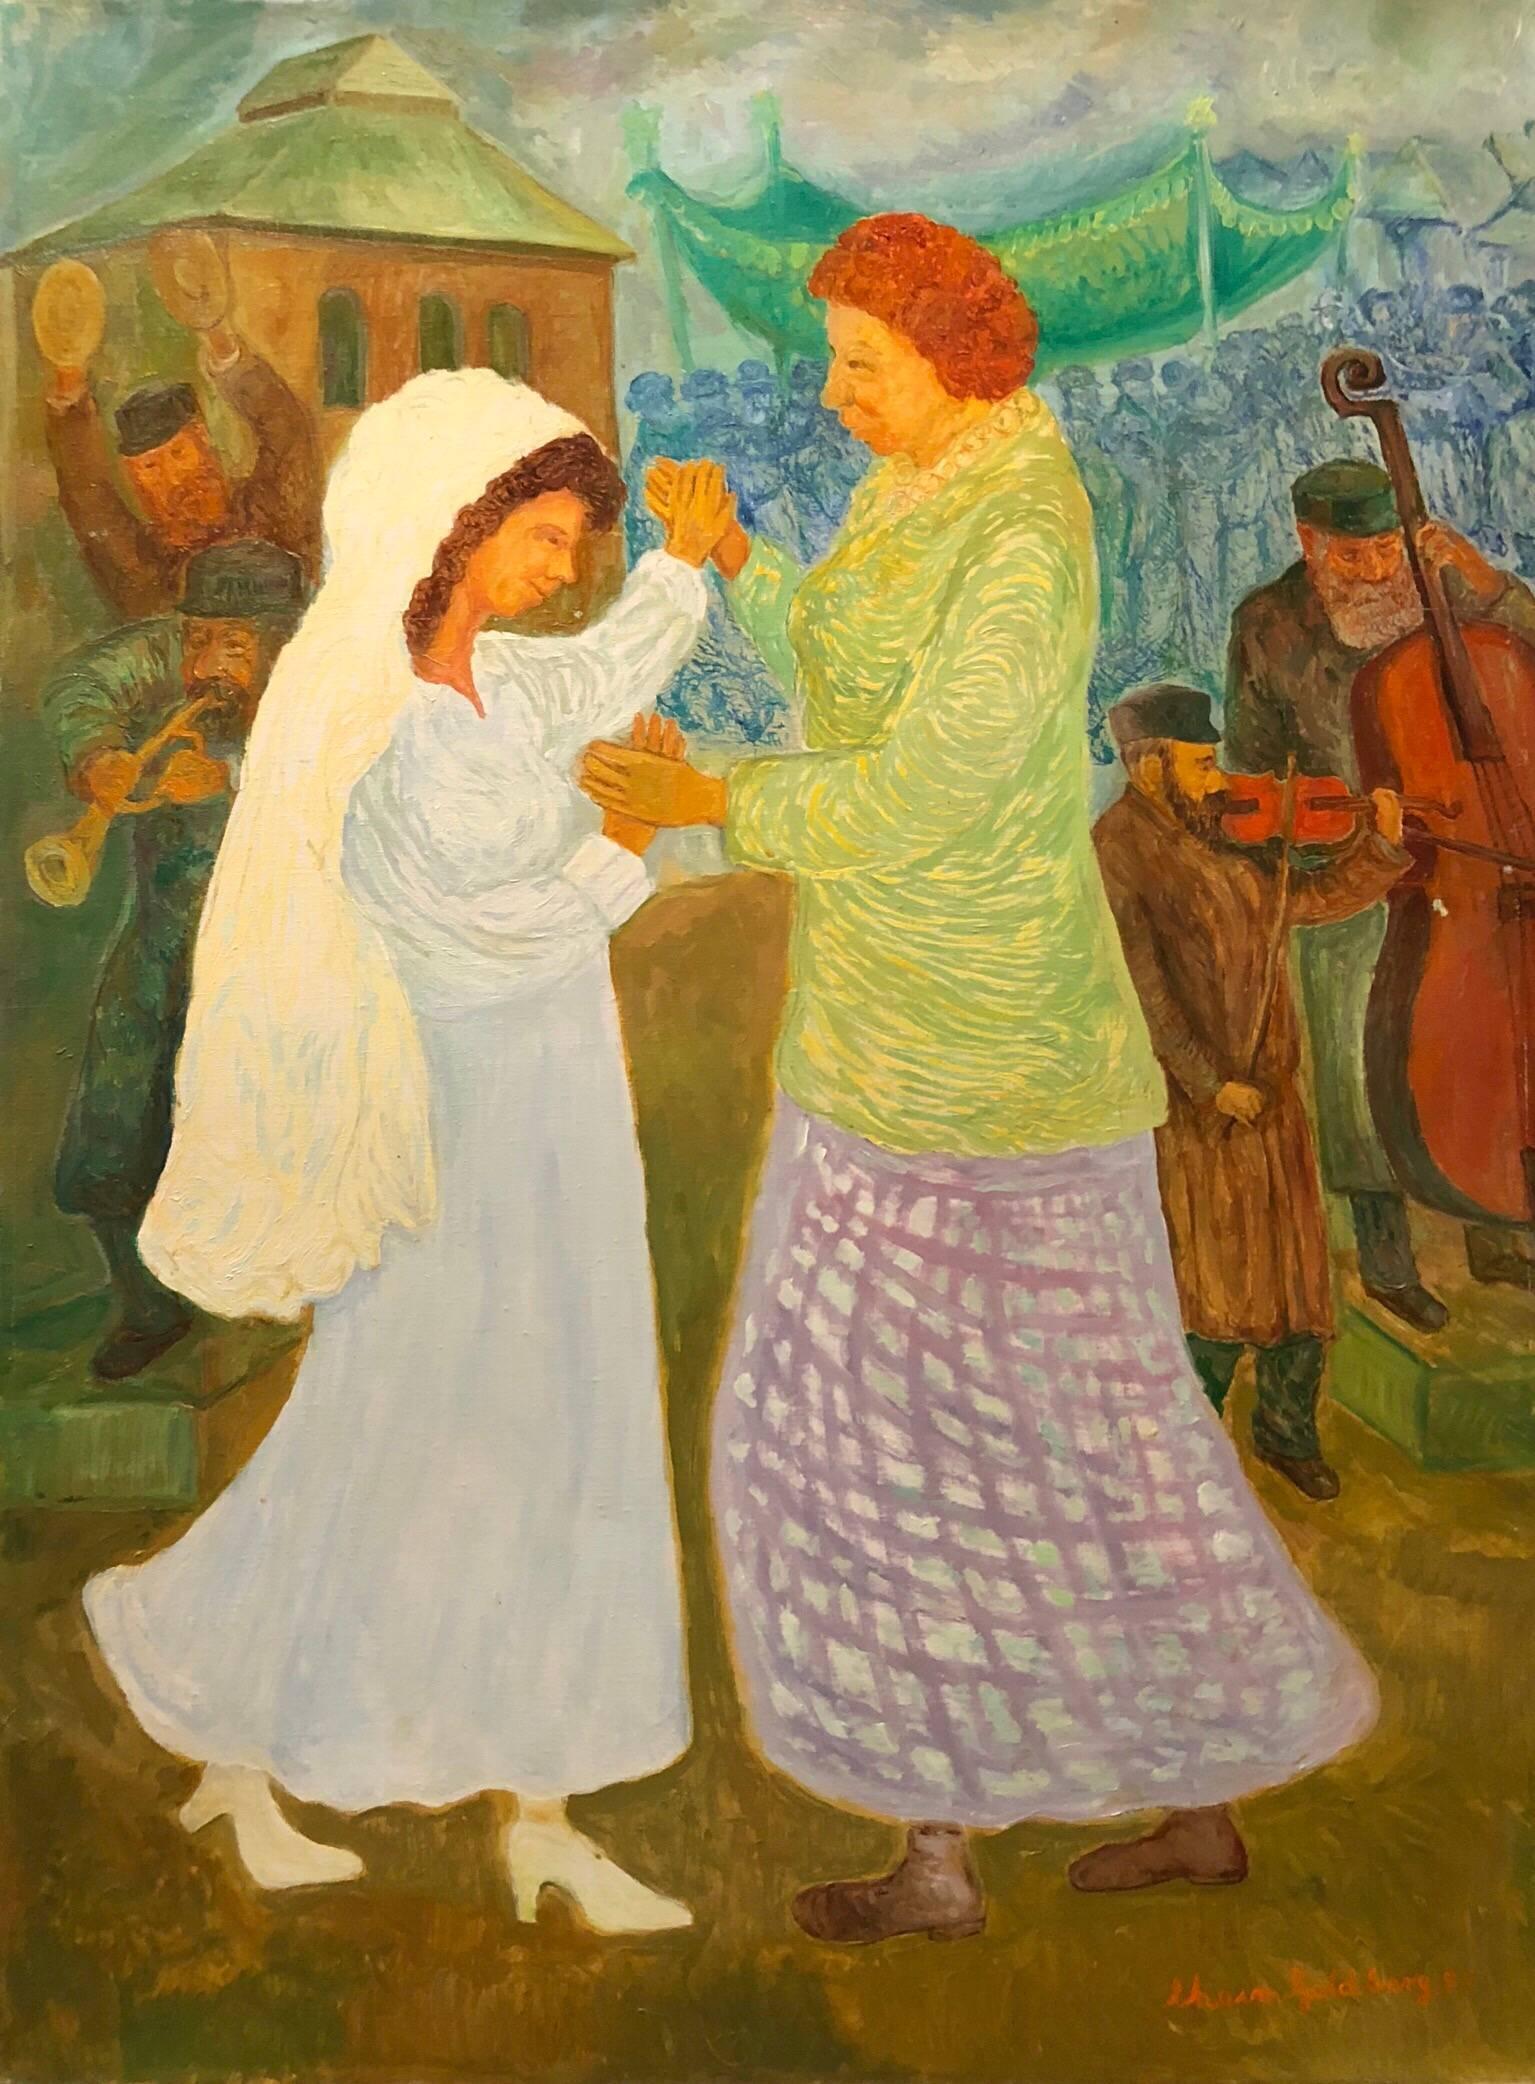 Mother Daughter Wedding Dance, Large Judaica Oil Painting, Shtetl Life